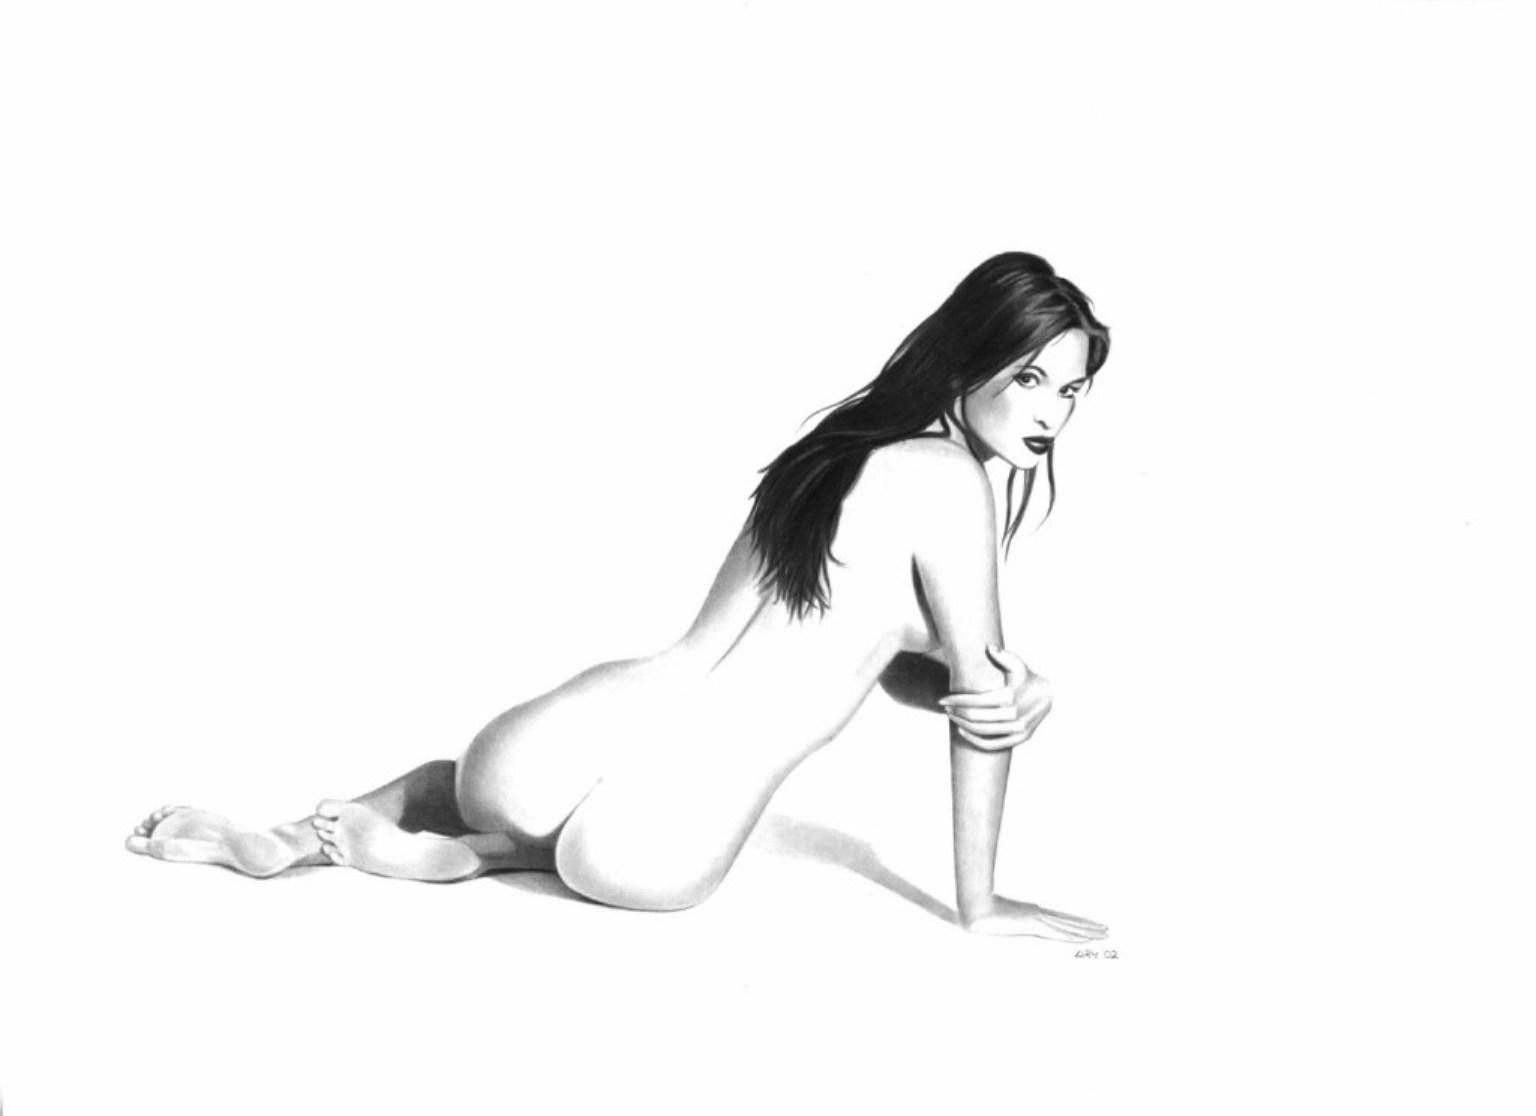 Эротика карандашом девушки 7 фотография